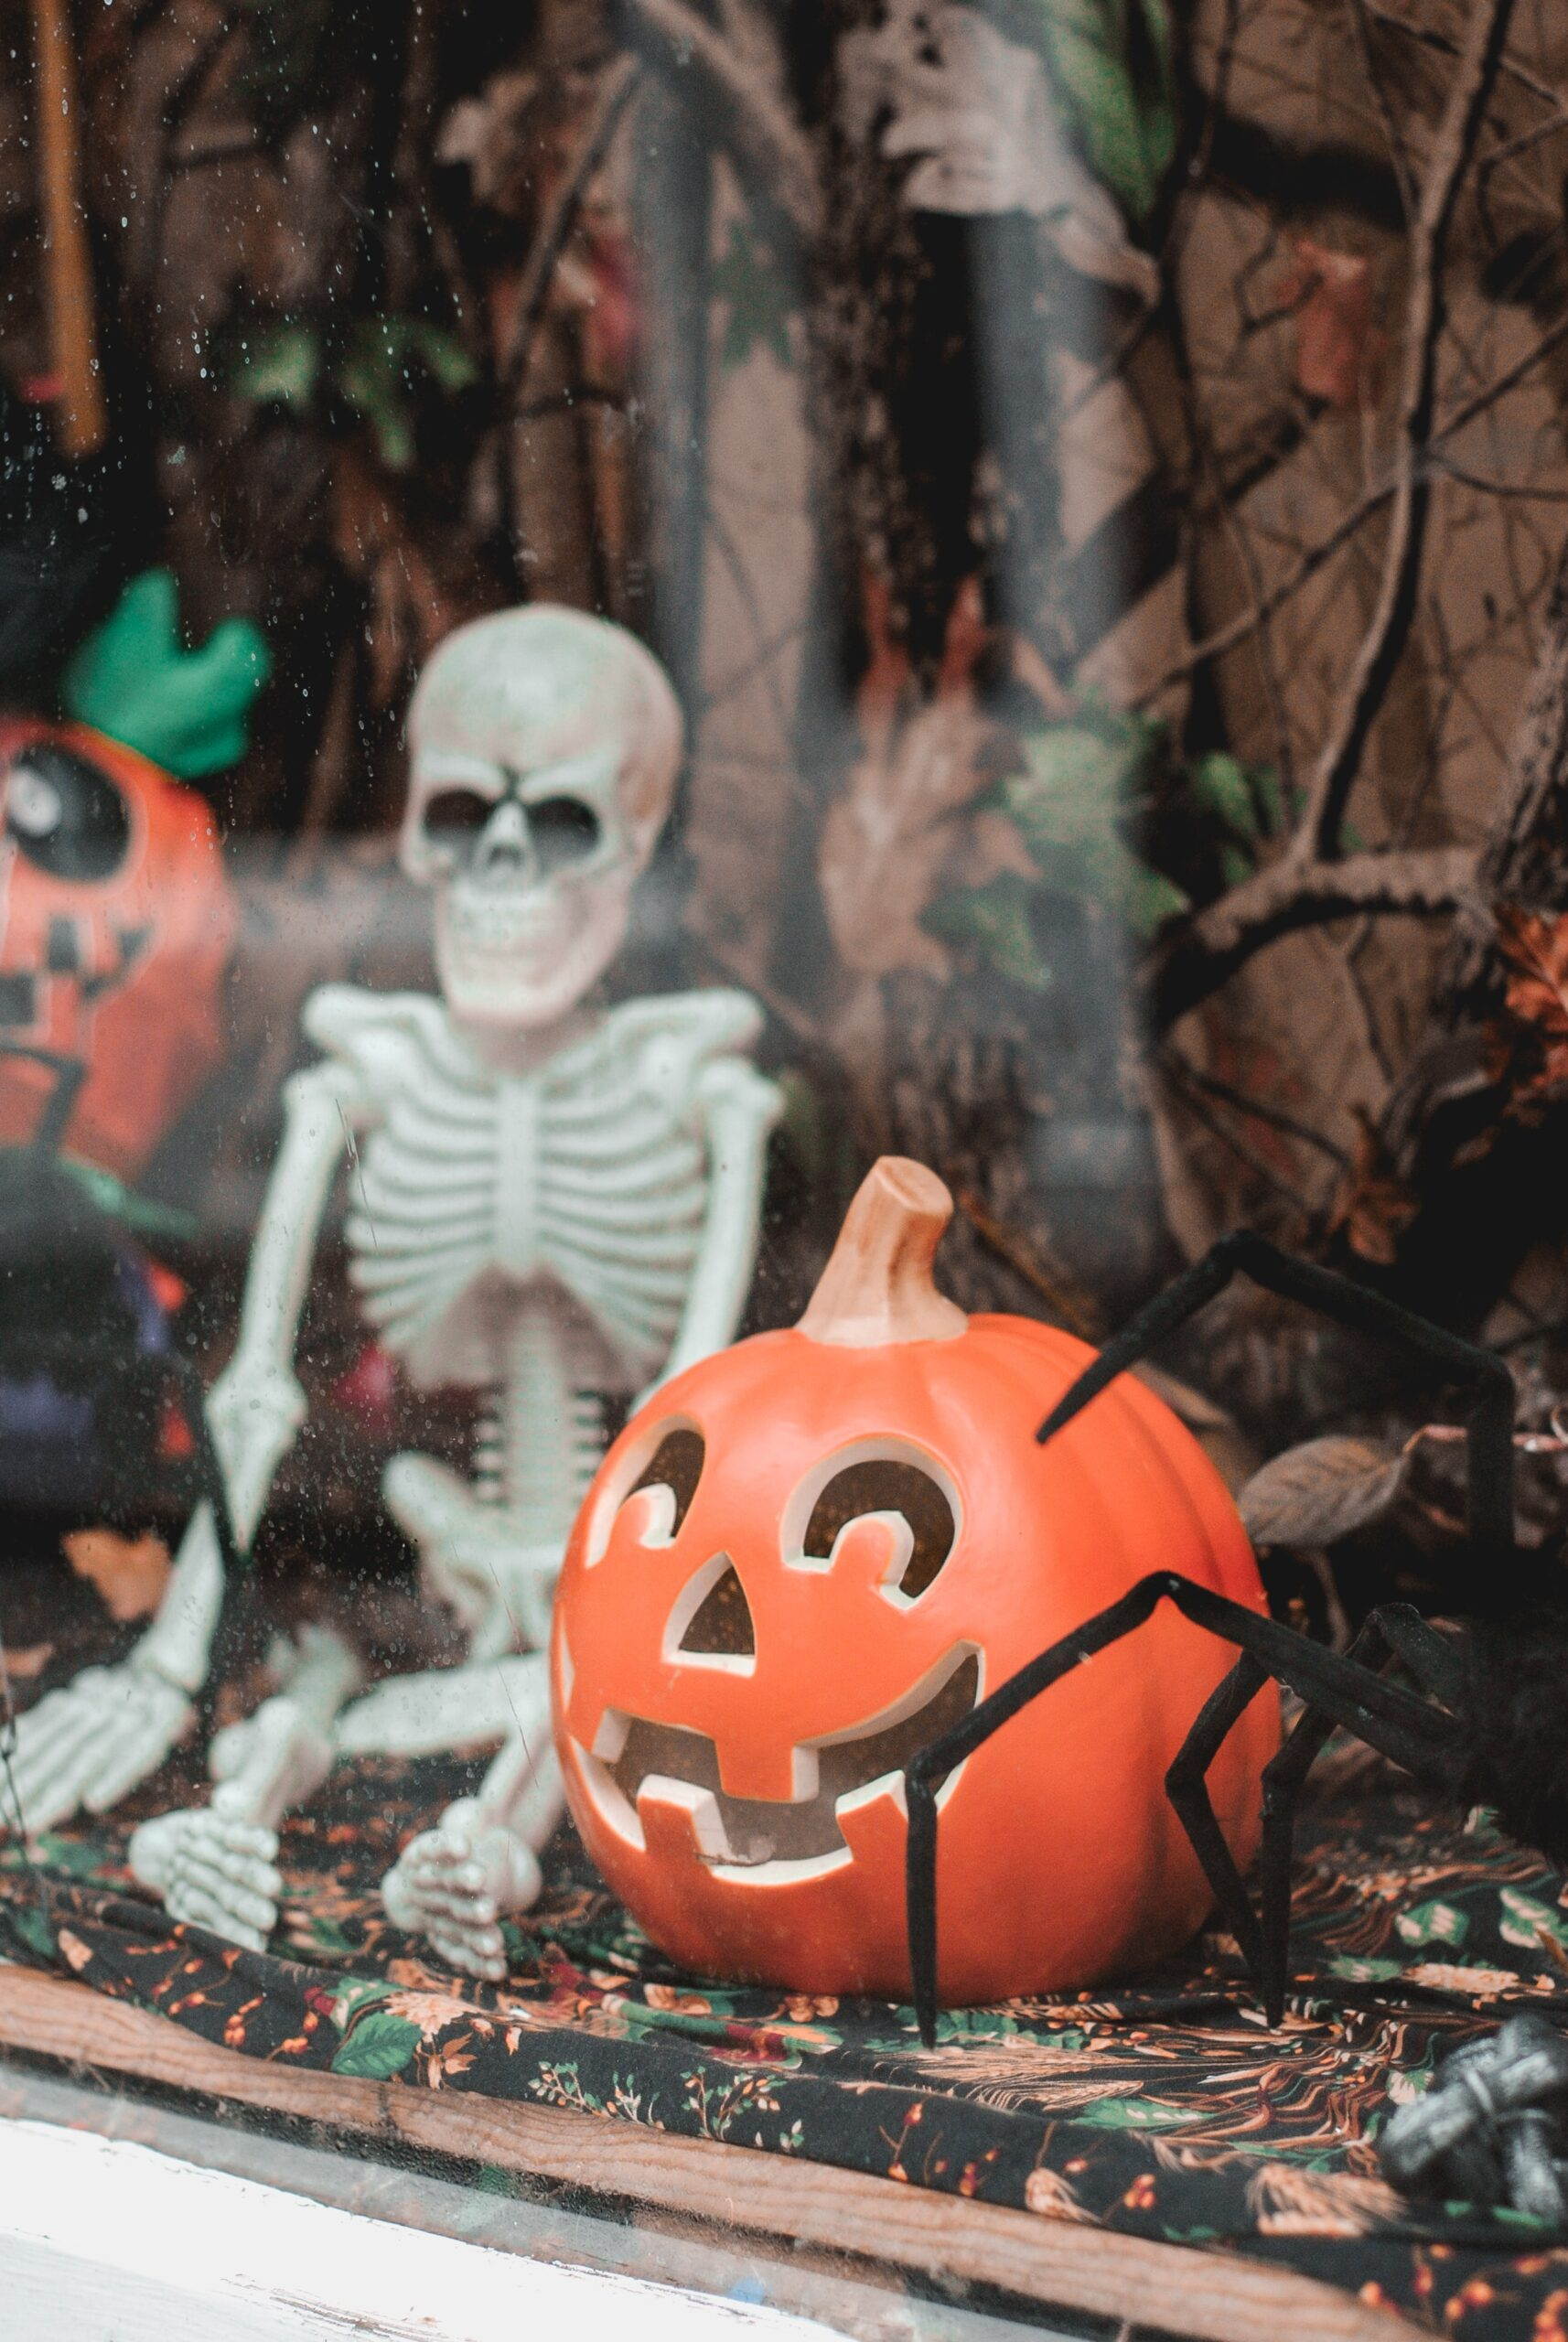 cute halloween decorations. Skeleton and pumpkin.